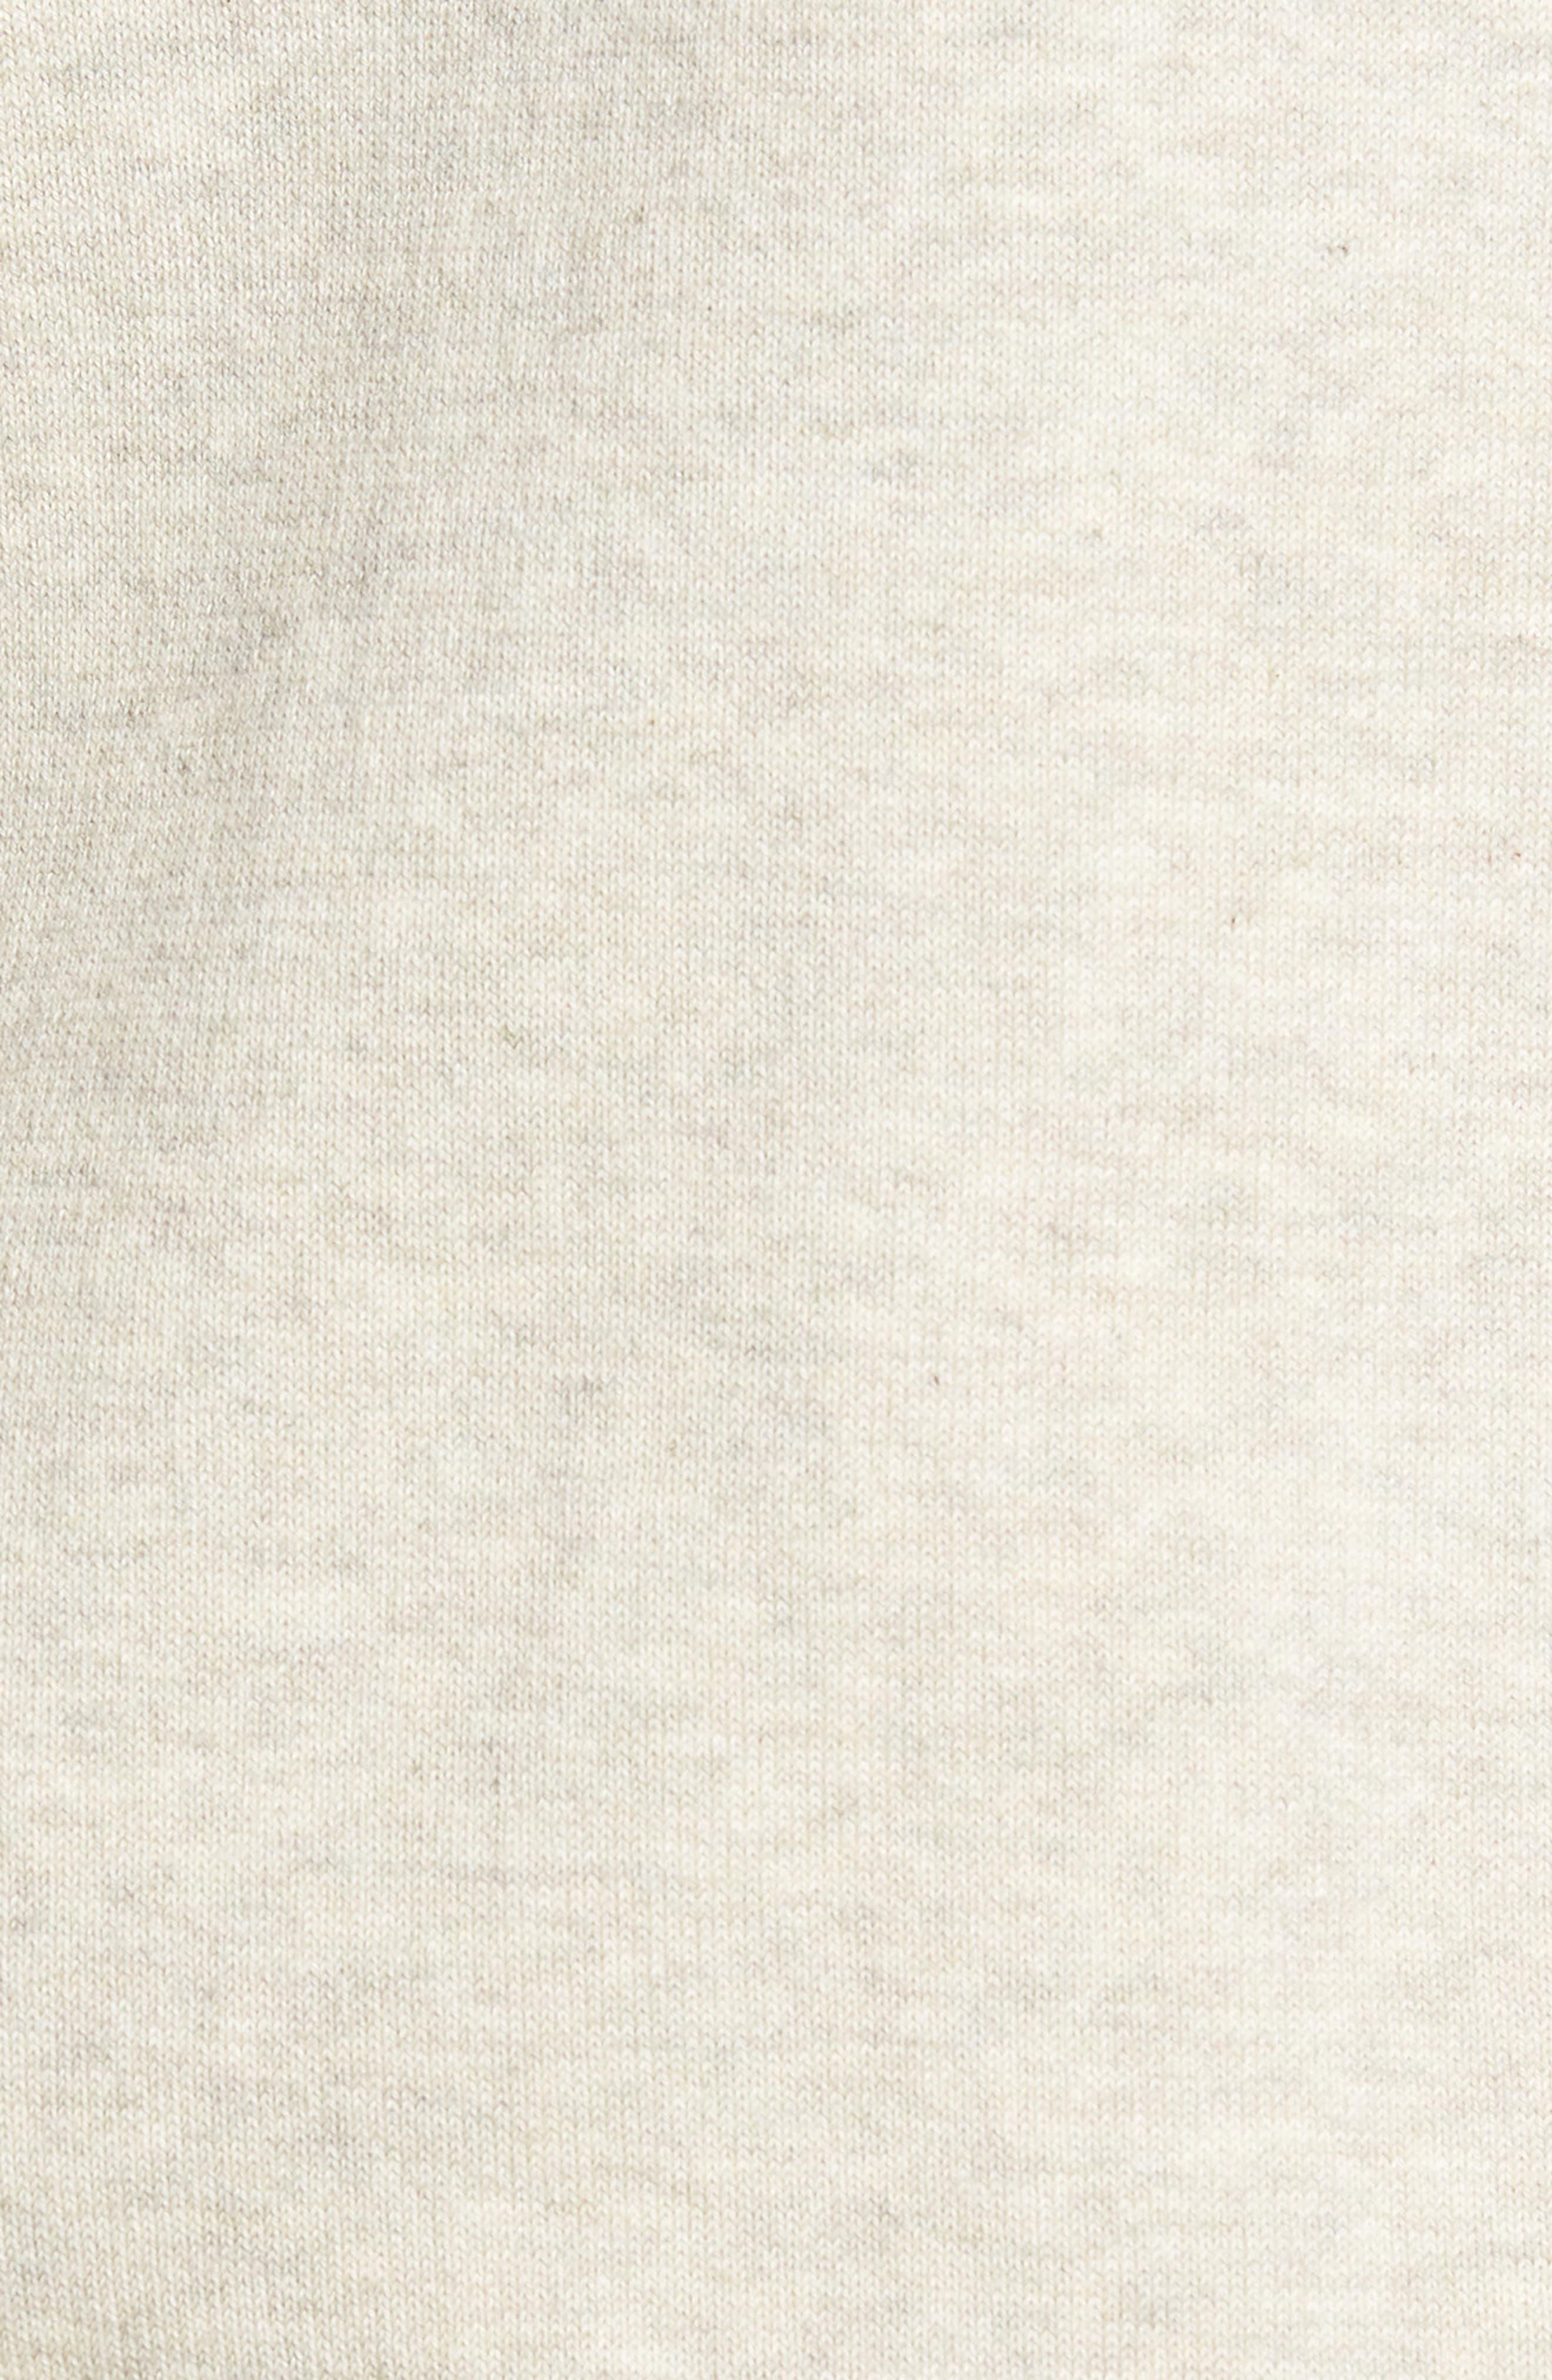 CUTTER & BUCK,                             Lakemont Classic Fit Quarter Zip Sweater,                             Alternate thumbnail 5, color,                             OATMEAL HEATHER